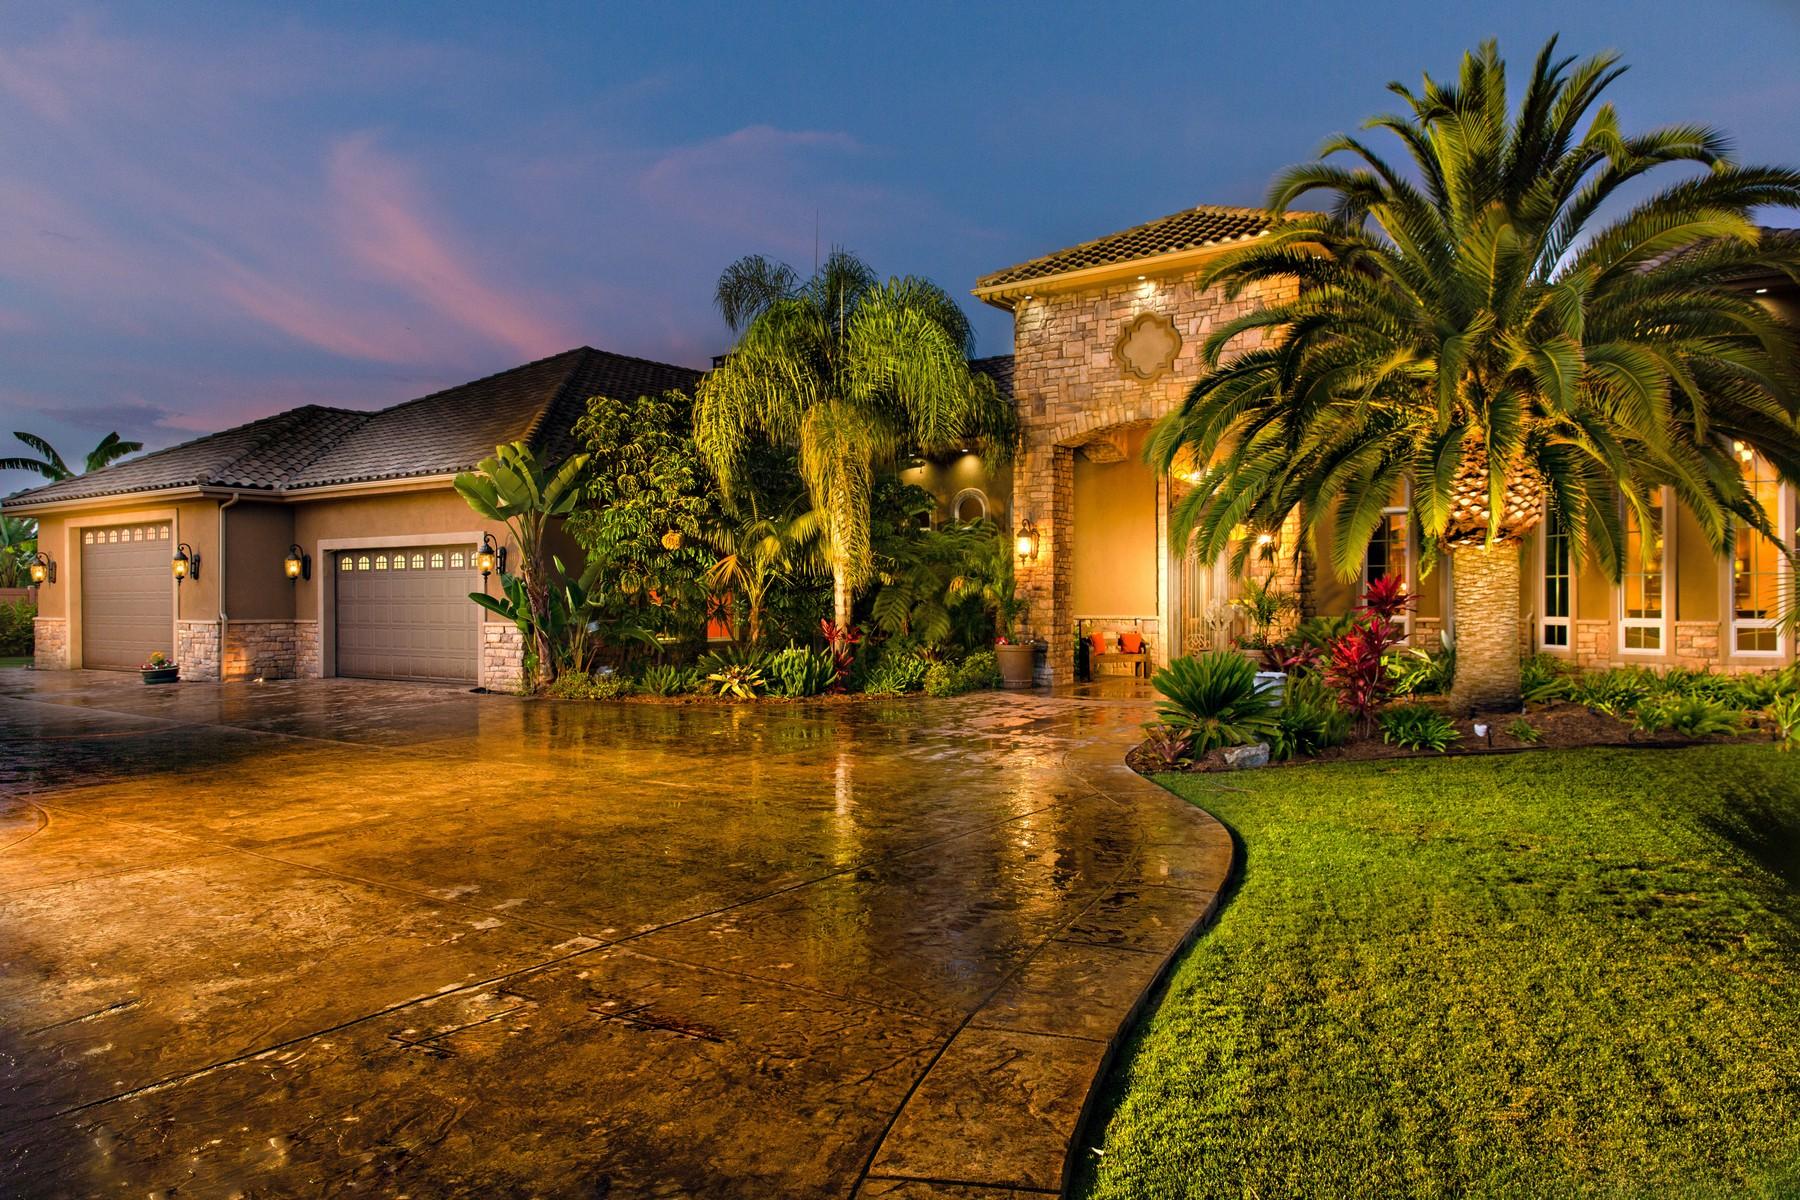 Single Family Home for Sale at 1010 Miramar Drive Vista, California, 92081 United States